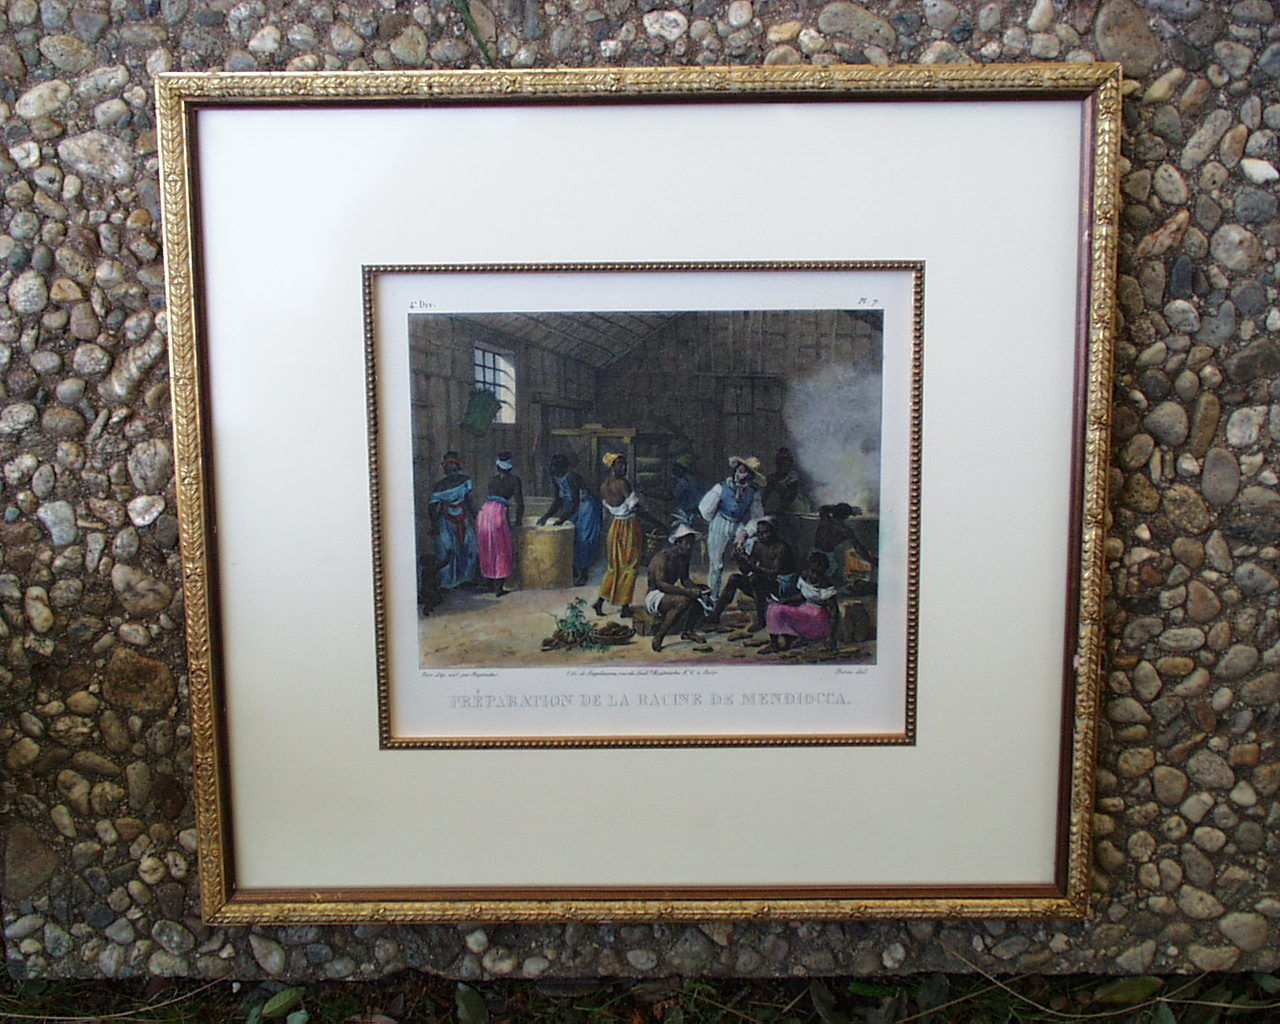 BRAZILIAN SLAVES PREPARING THE MANOIC ROOT VINTAGE CHROMOLITHOGRAPH J.M.RUGENDAS - $7.99